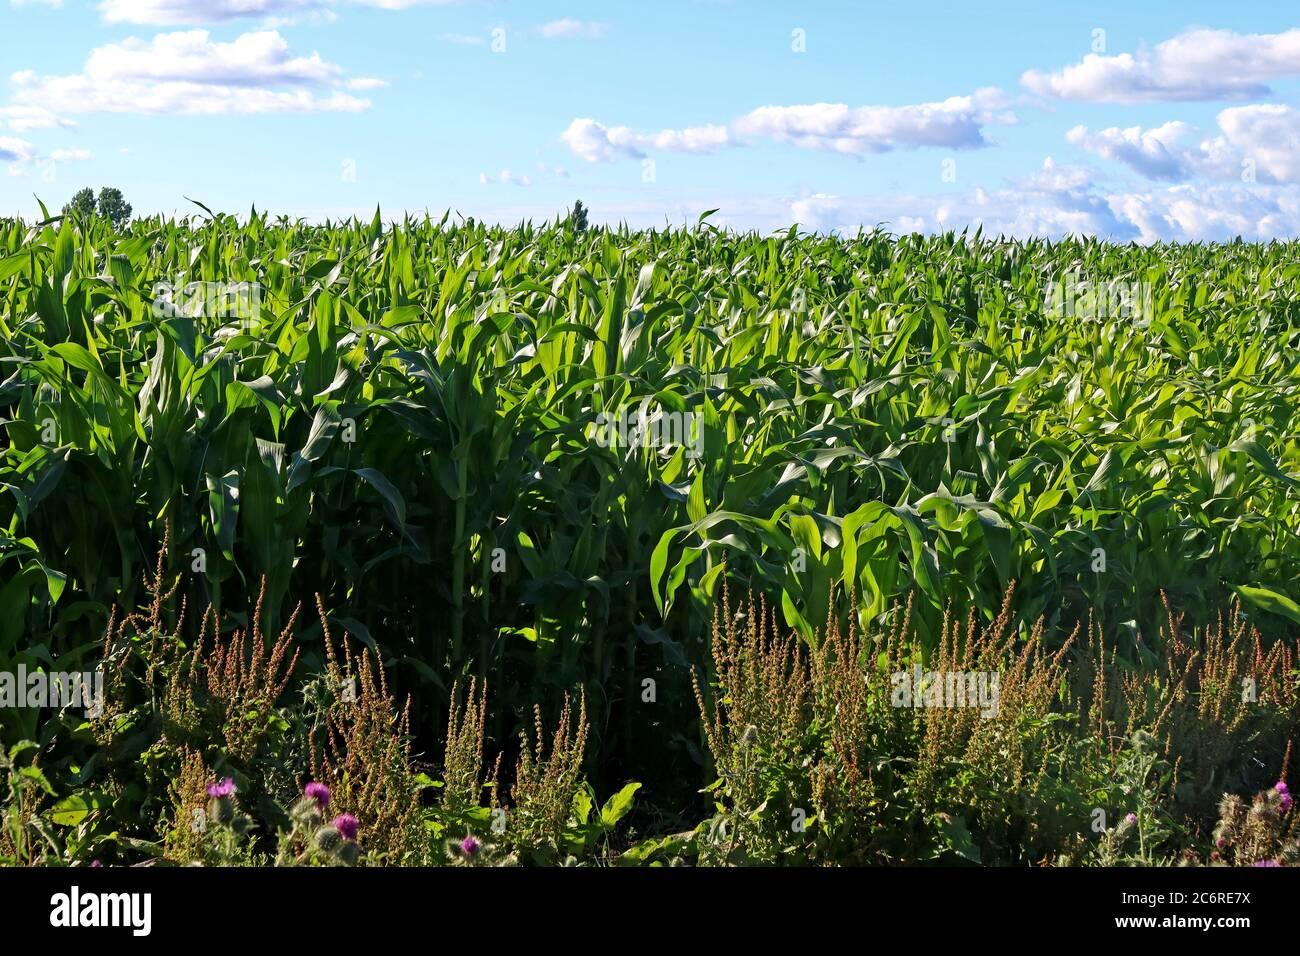 GoTonySmith,HotpixUK,@HotpixUK,England,Cheshire,UK,Maize field,farming,farmed,field of maize,field of corn,cereal grain,cereal,grain